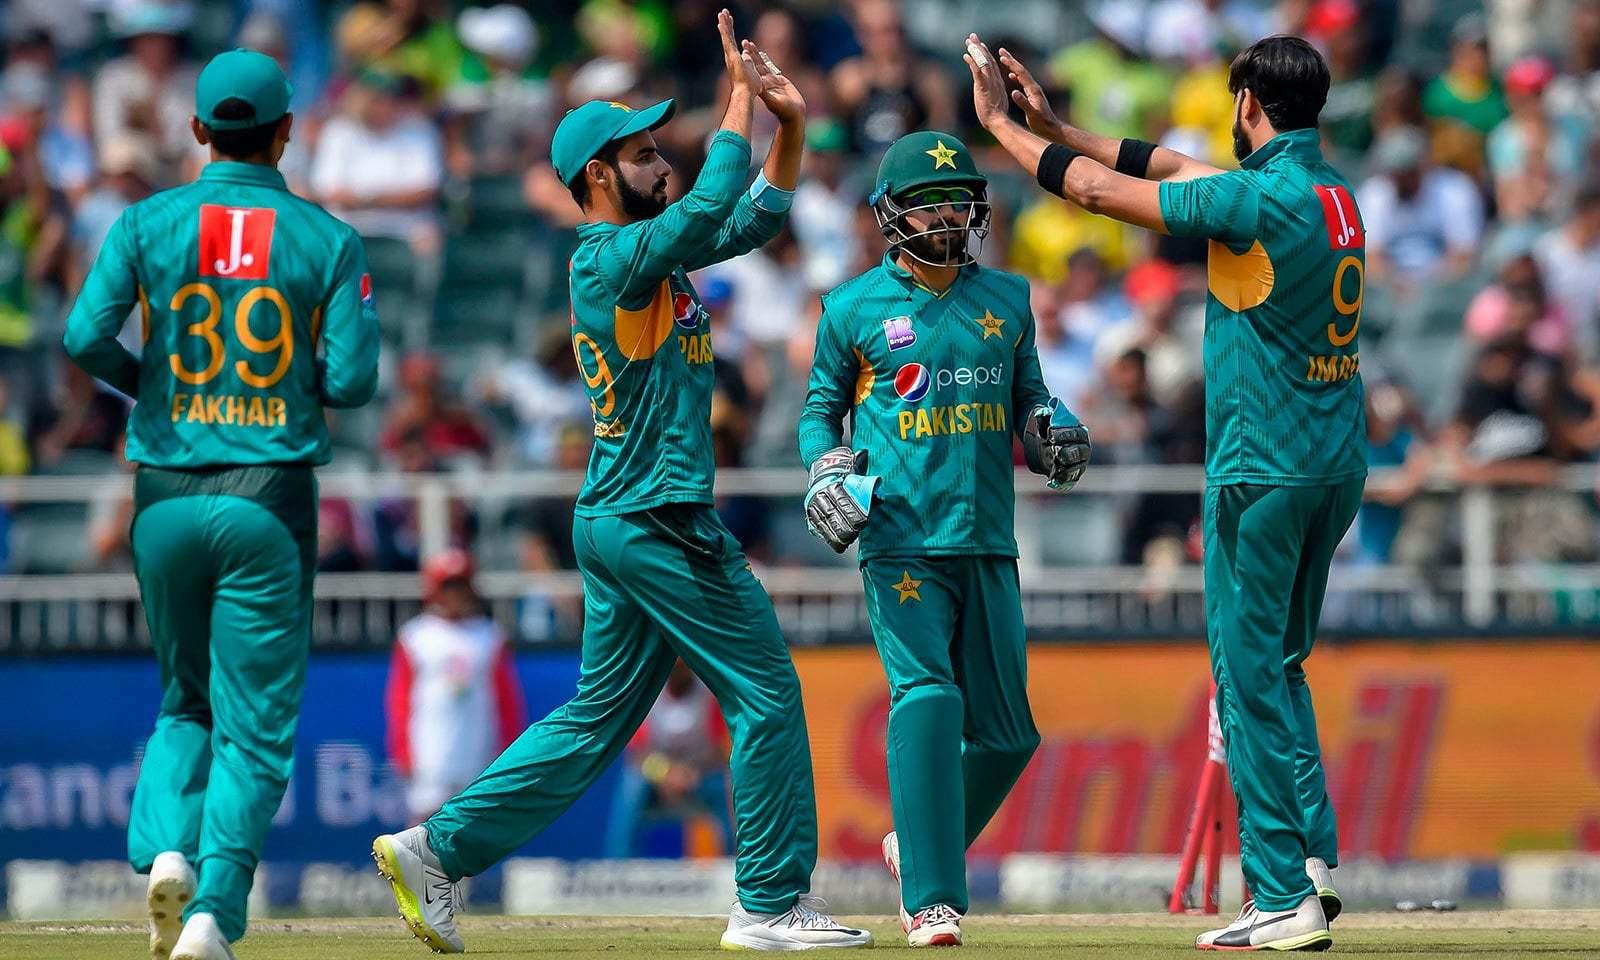 پاکستان بدستور پہلی پوزیشن پر برقرار — فائل فوٹو: اے ایف پی